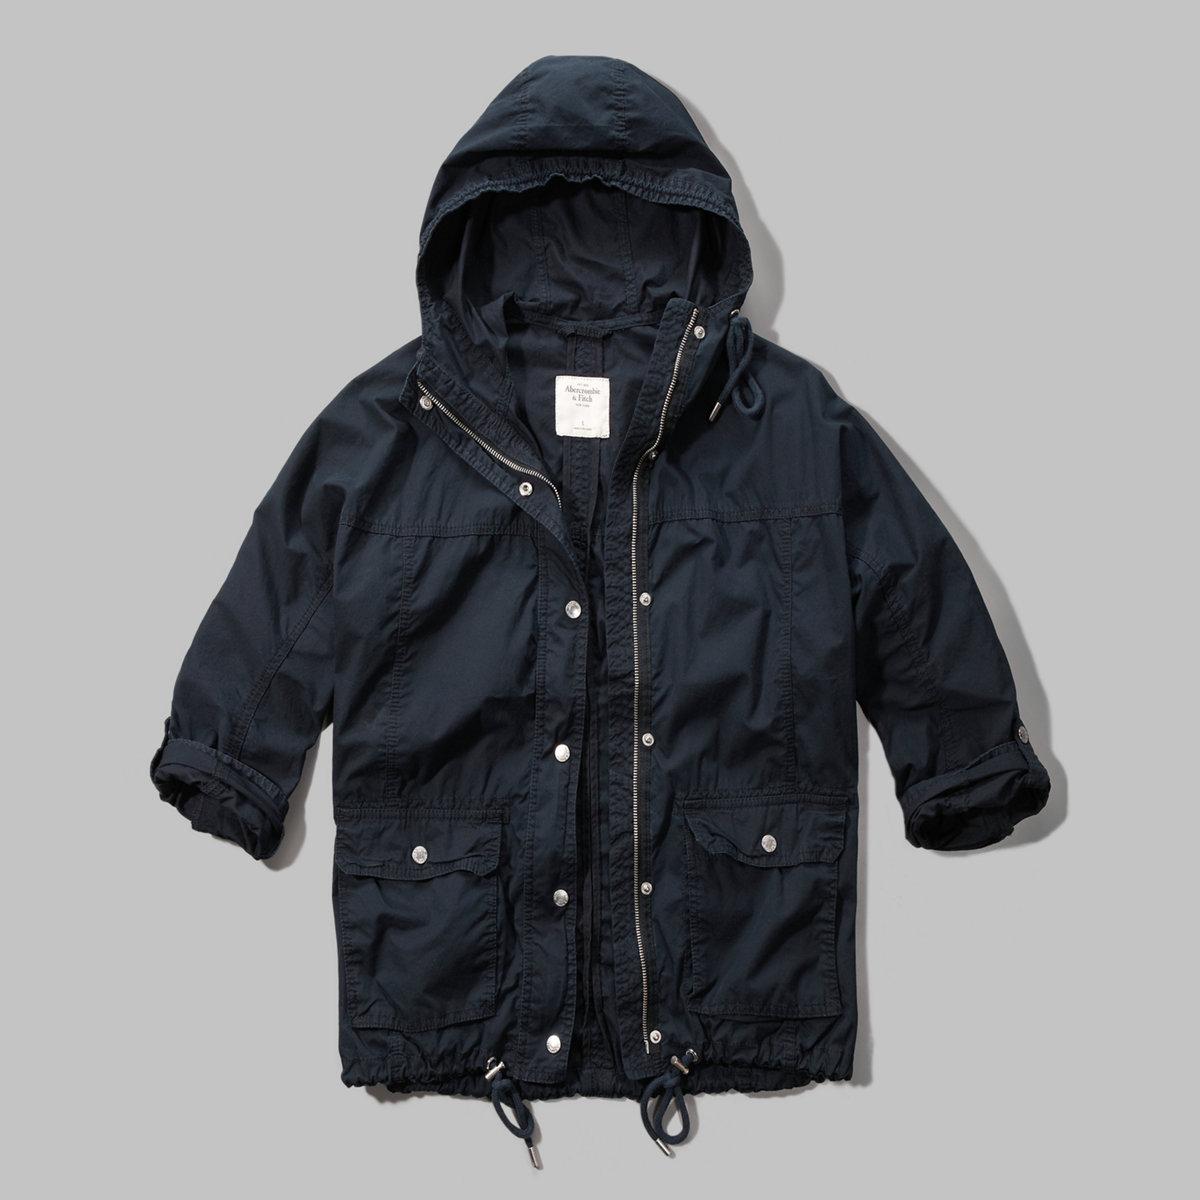 Twill Anorak Jacket